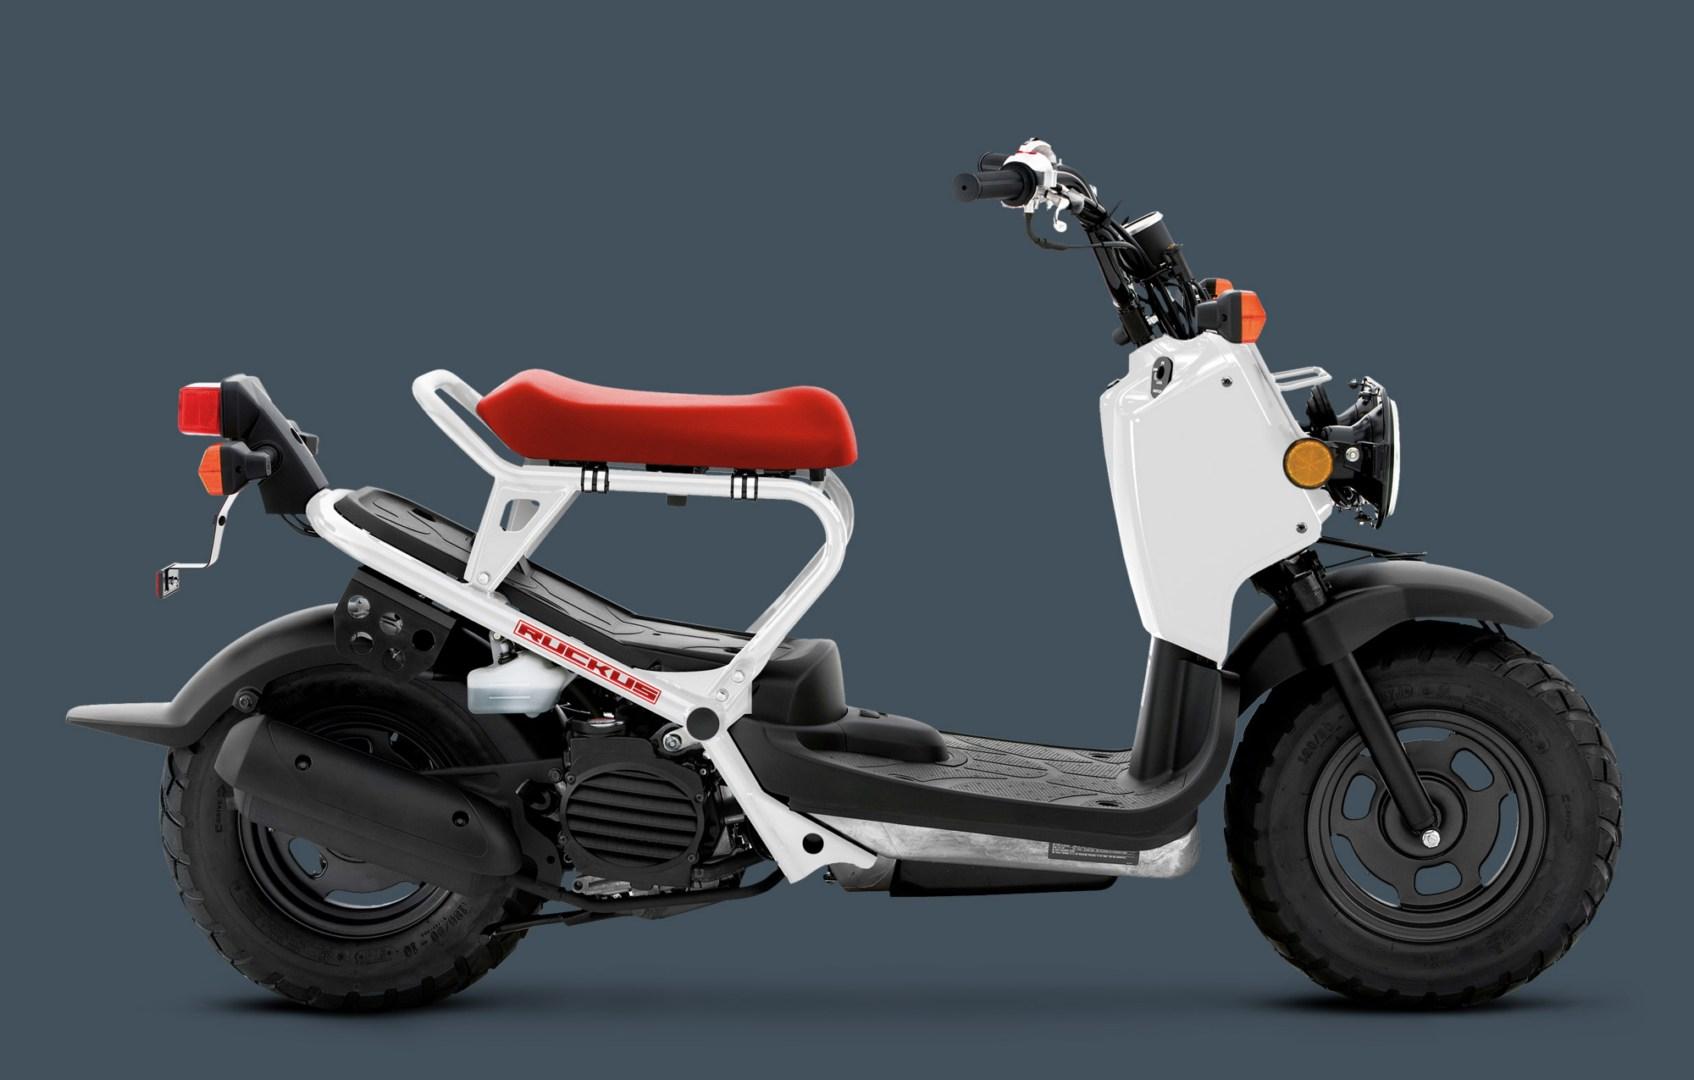 2013 Honda Ruckus When Fun Meets Function 52231